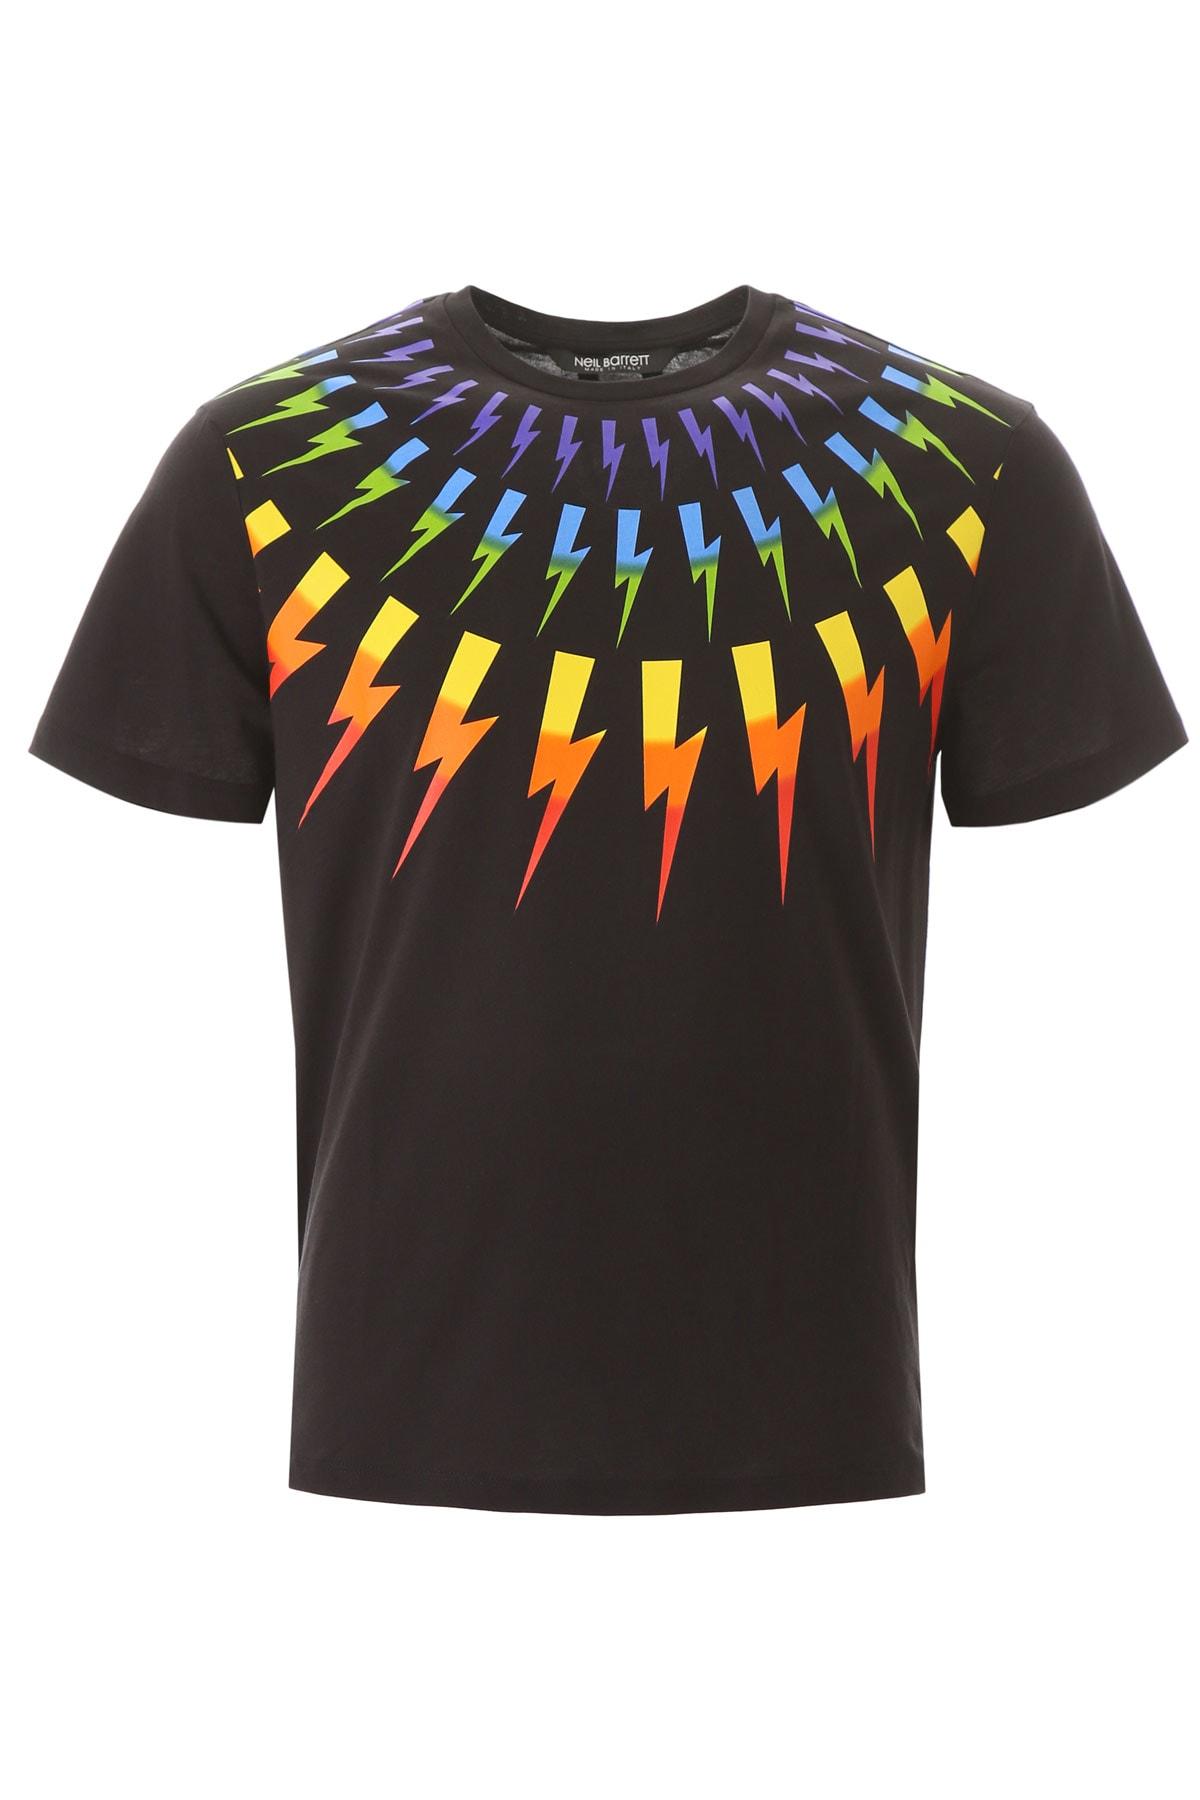 Neil Barrett Rainbow Thunder T-shirt